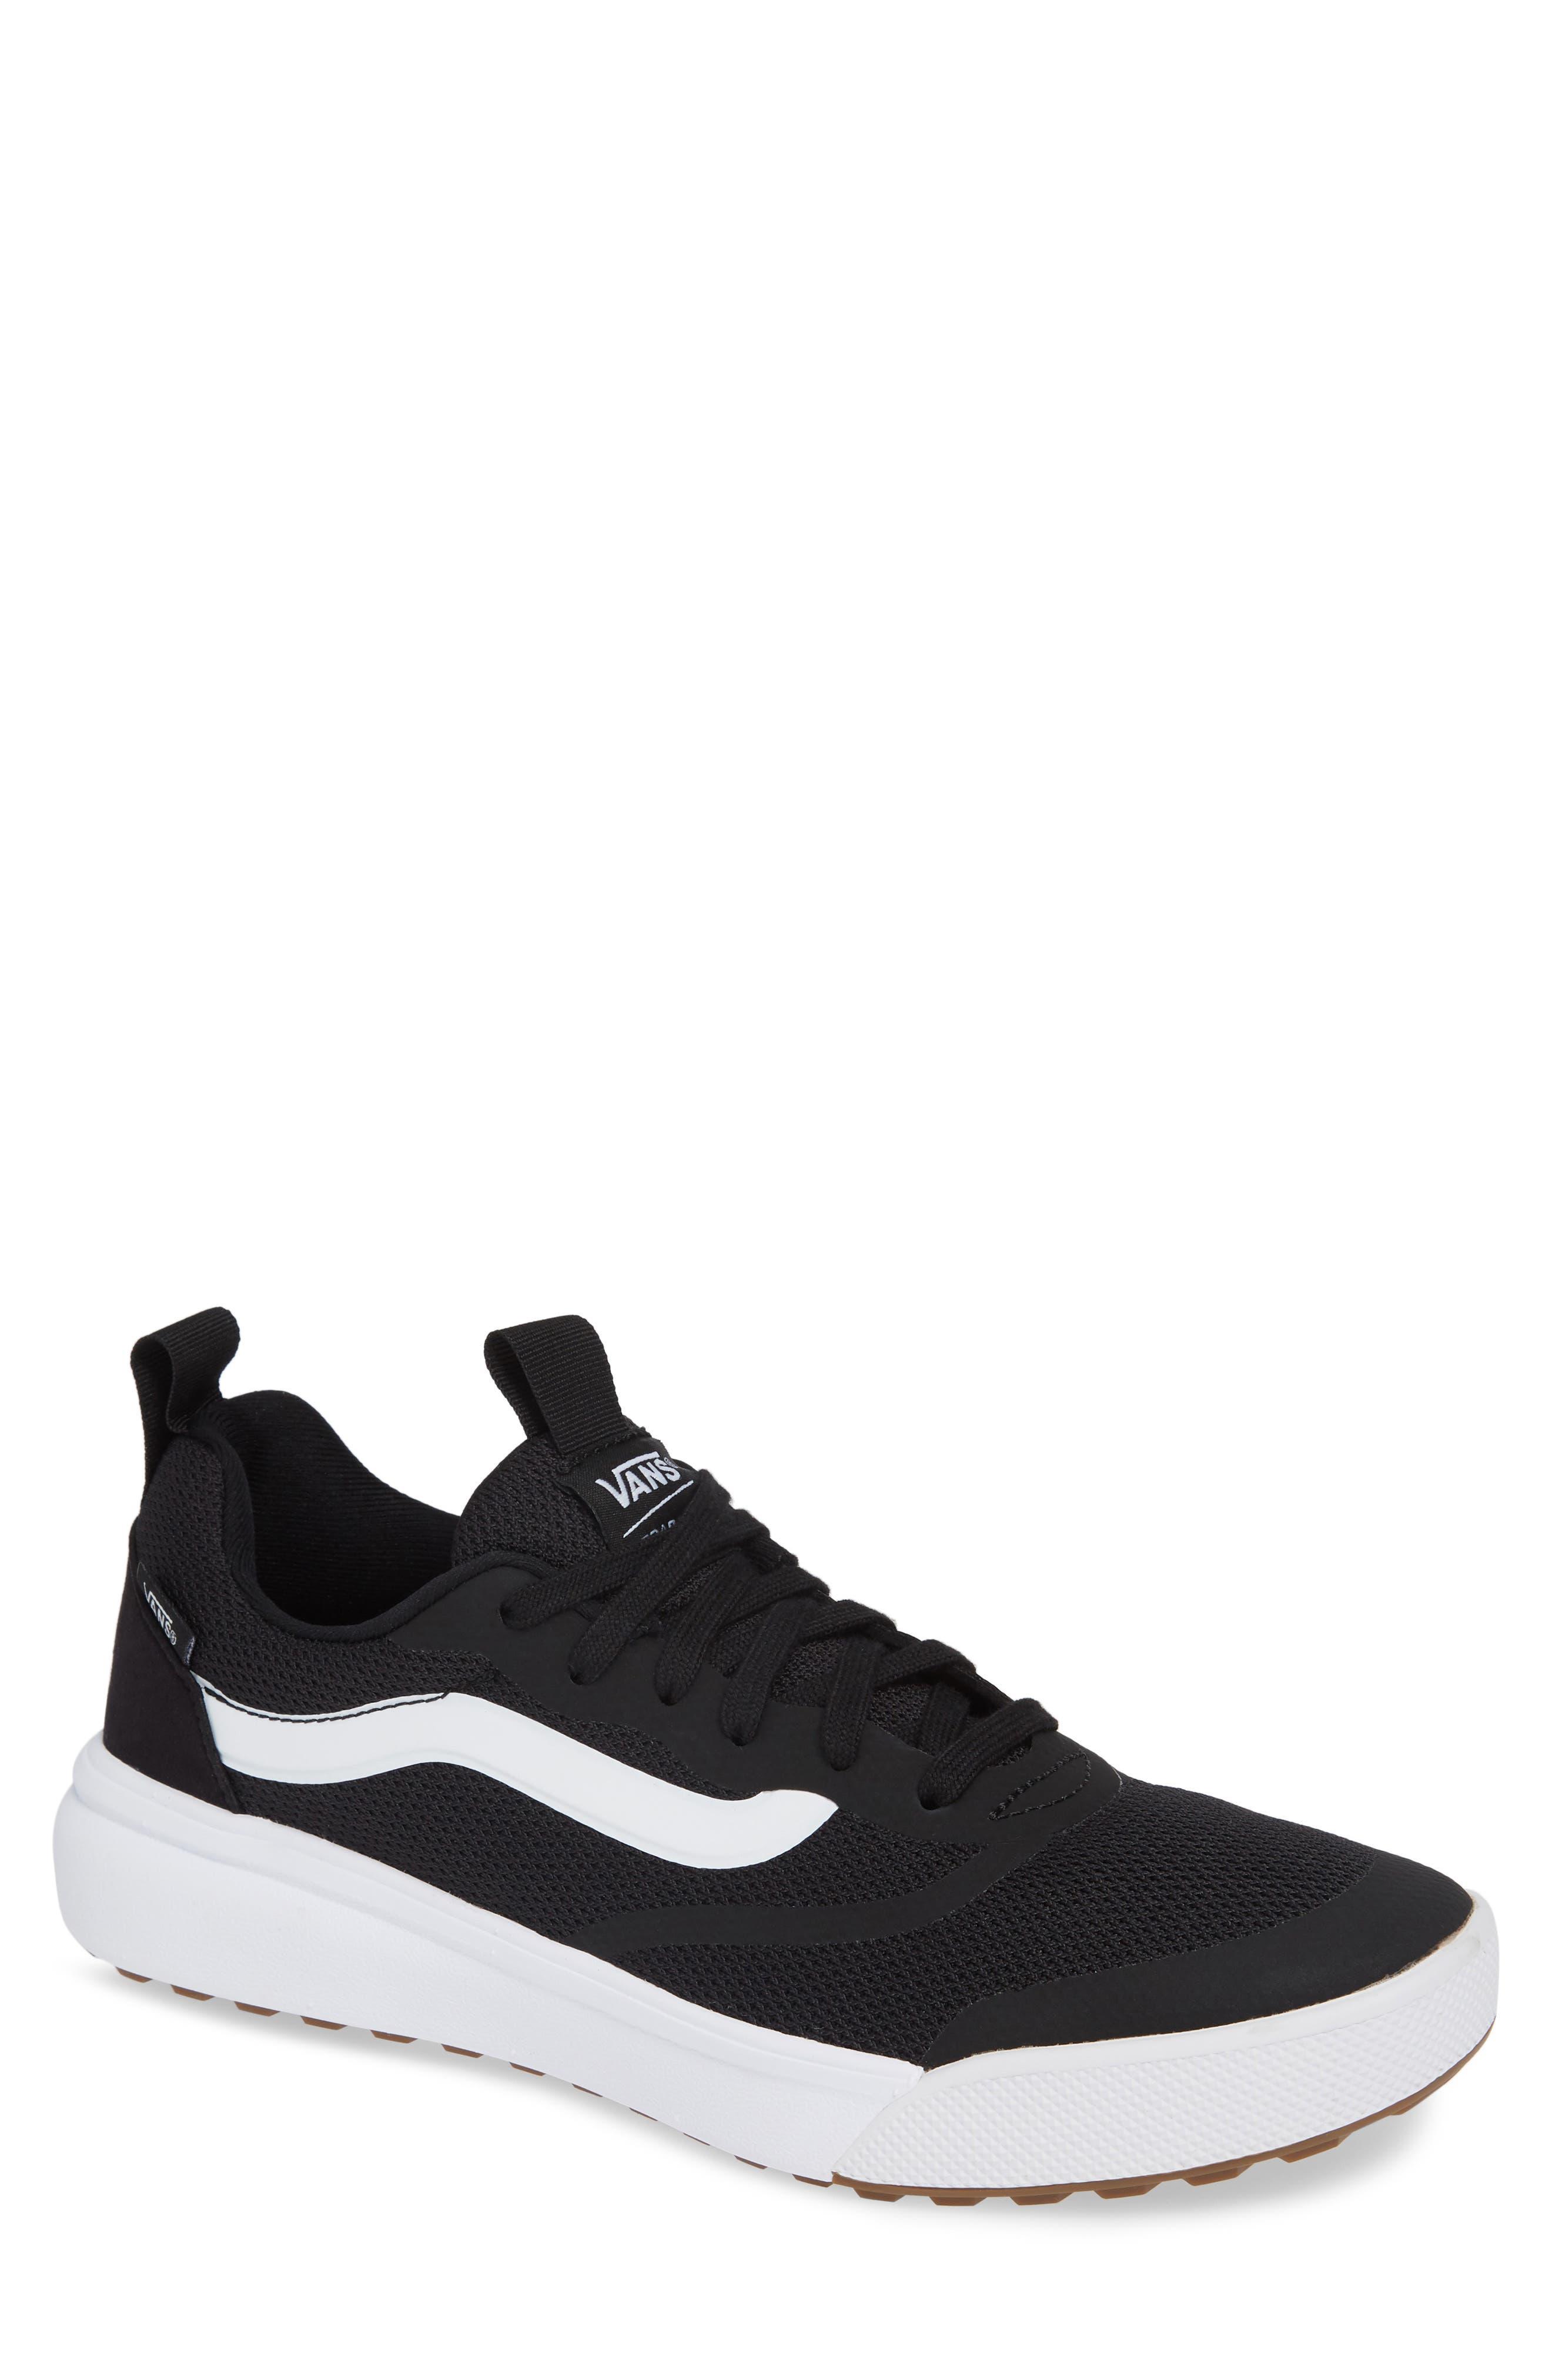 Ultrarange Rapidwield Sneaker,                         Main,                         color, BLACK/ WHITE MESH